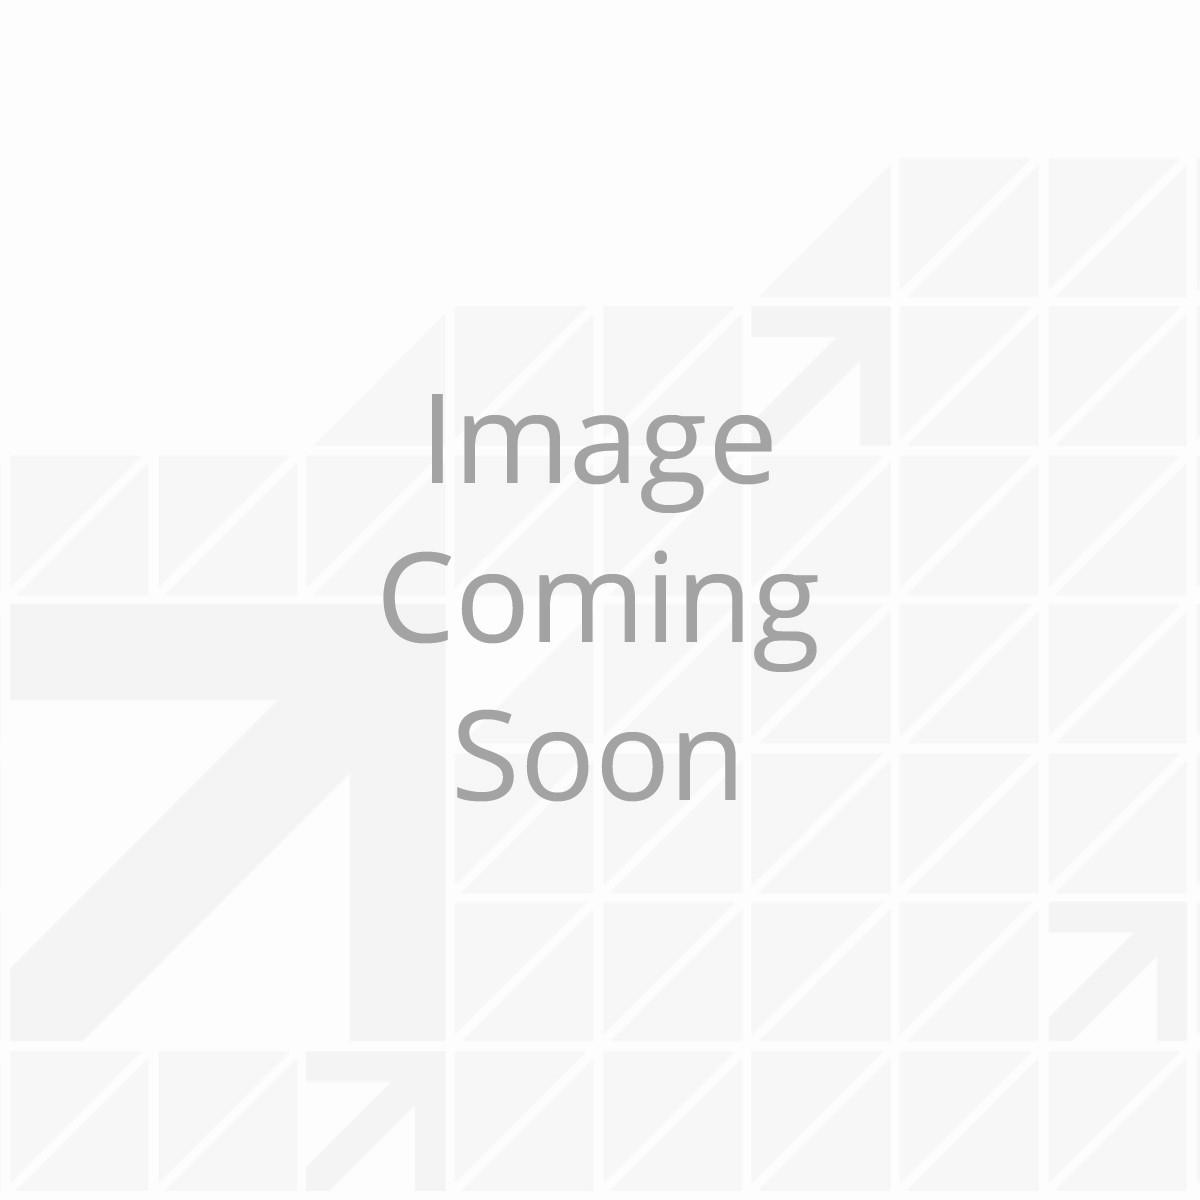 60th Anniversary/Core Values Hooded Sweatshirt